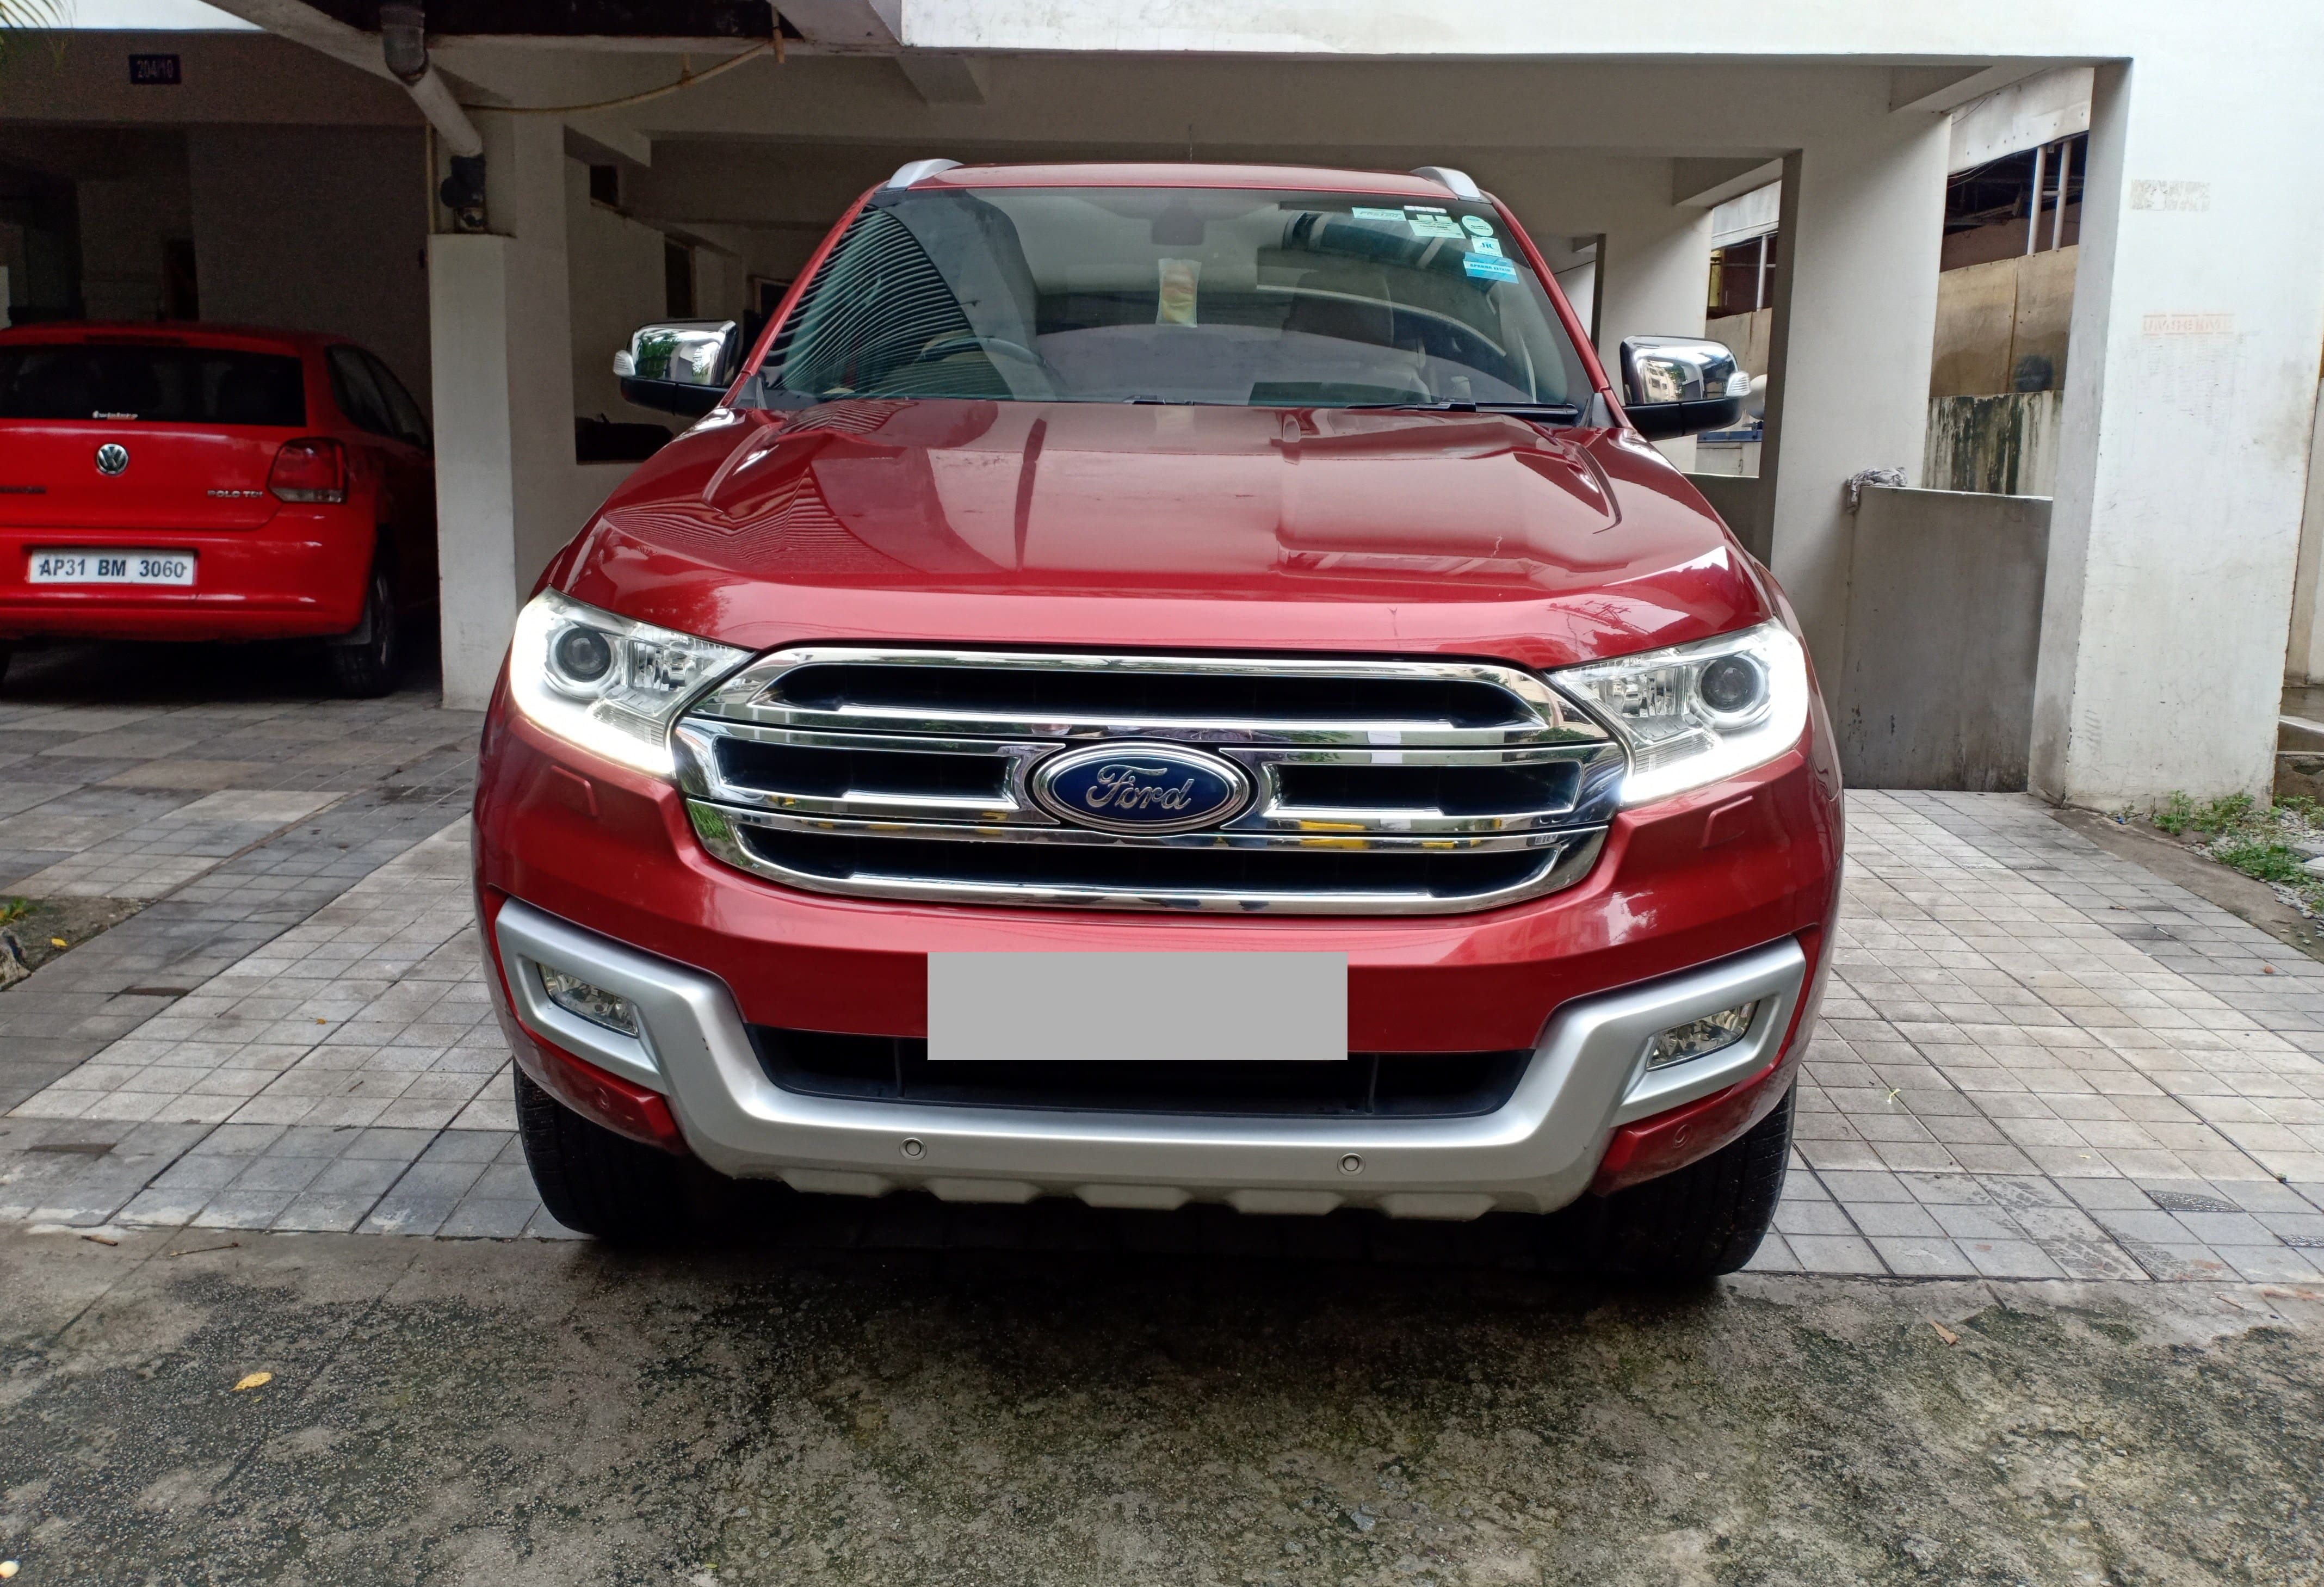 Ford Endeavour 2015-2020 3.2 Titanium AT 4X4